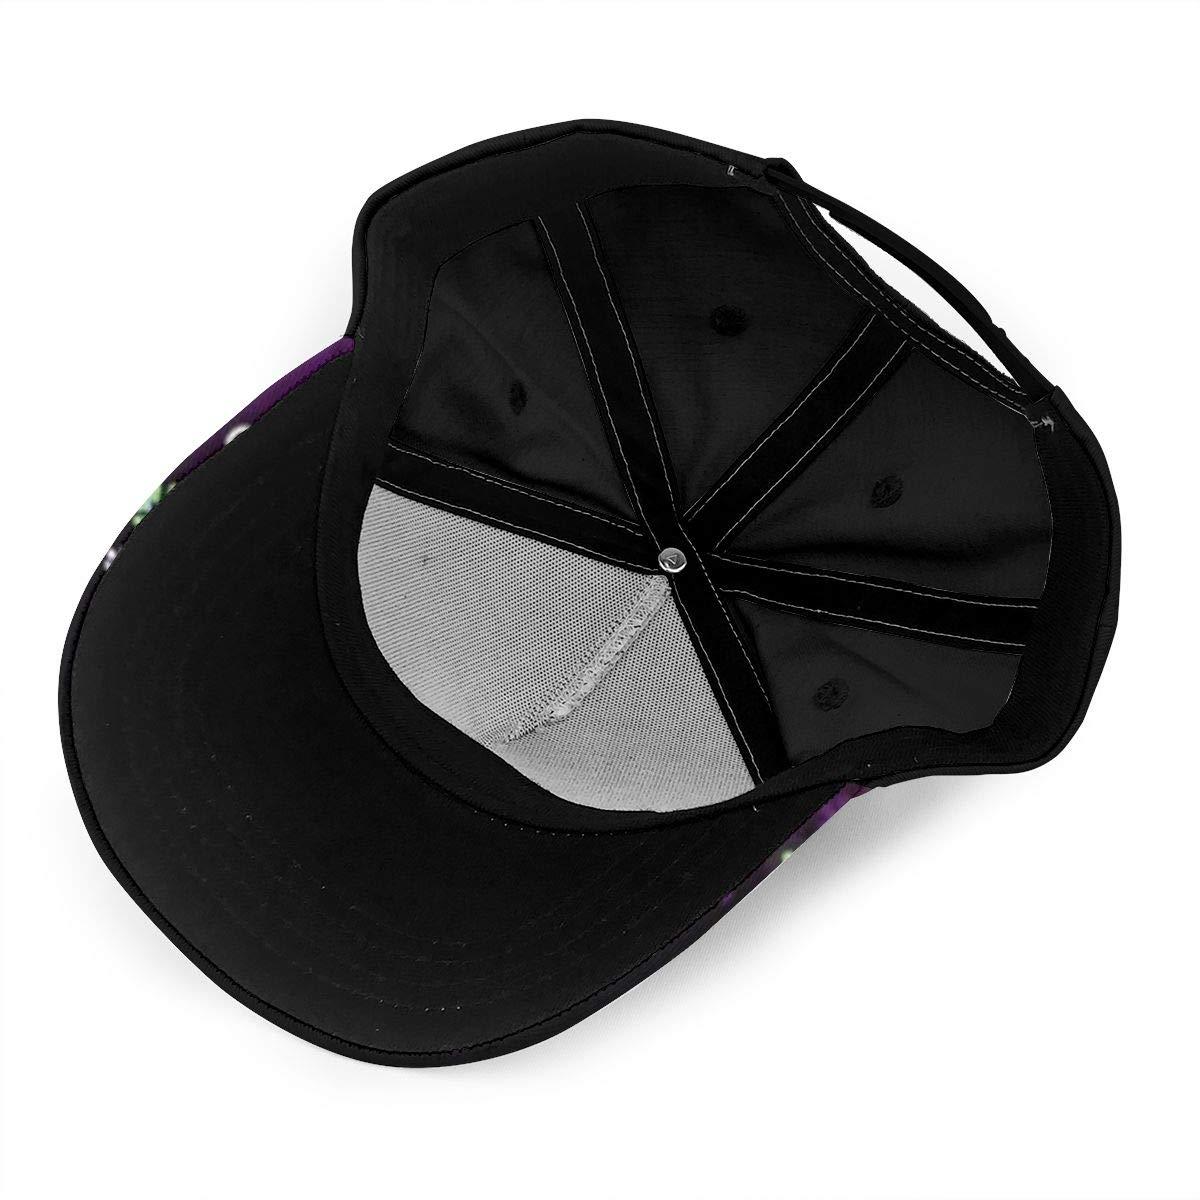 Purple Flower Design Summer Baseball Caps for Men and Women with Adjustable Snapback Strap